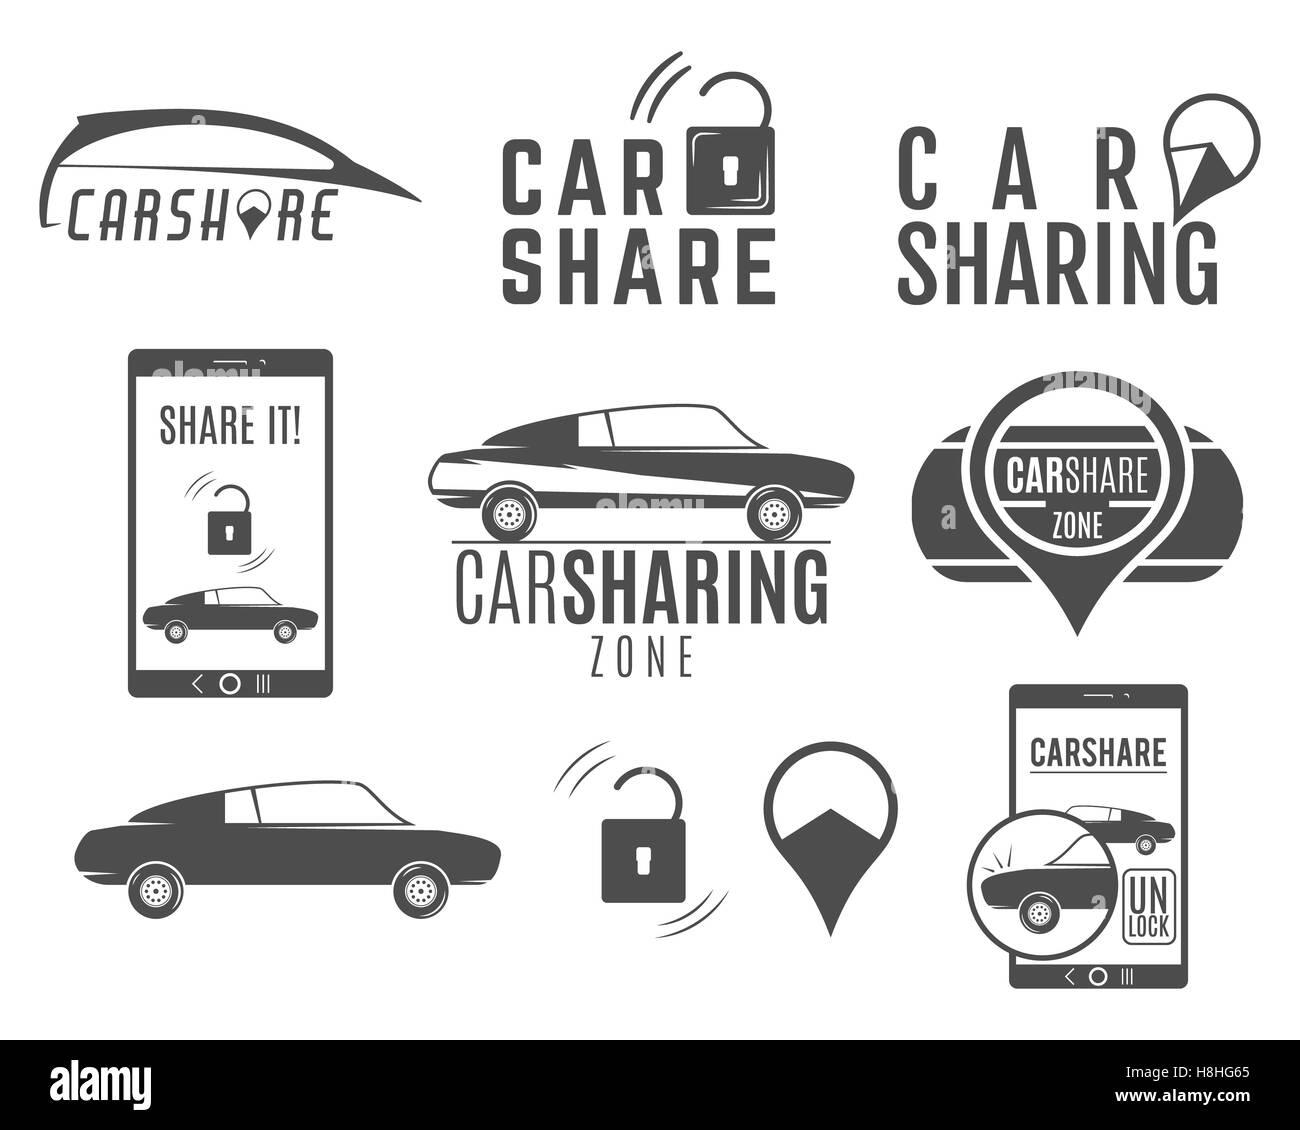 Car share logo designs set. Car Sharing concepts. Collective usage of cars via web application. Carsharing icons, - Stock Image